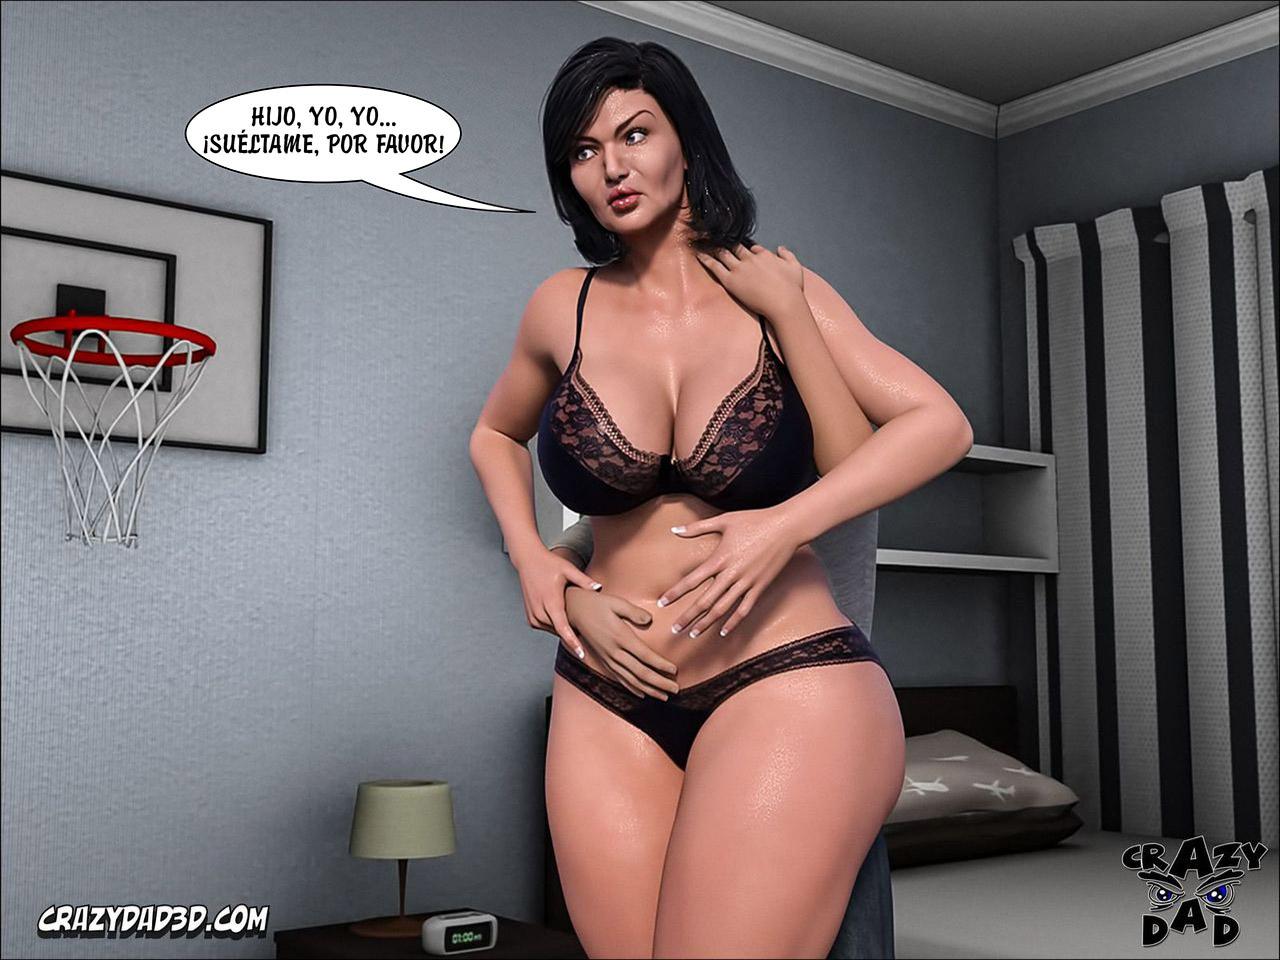 Anny Dear OLDER SISTER parte 4